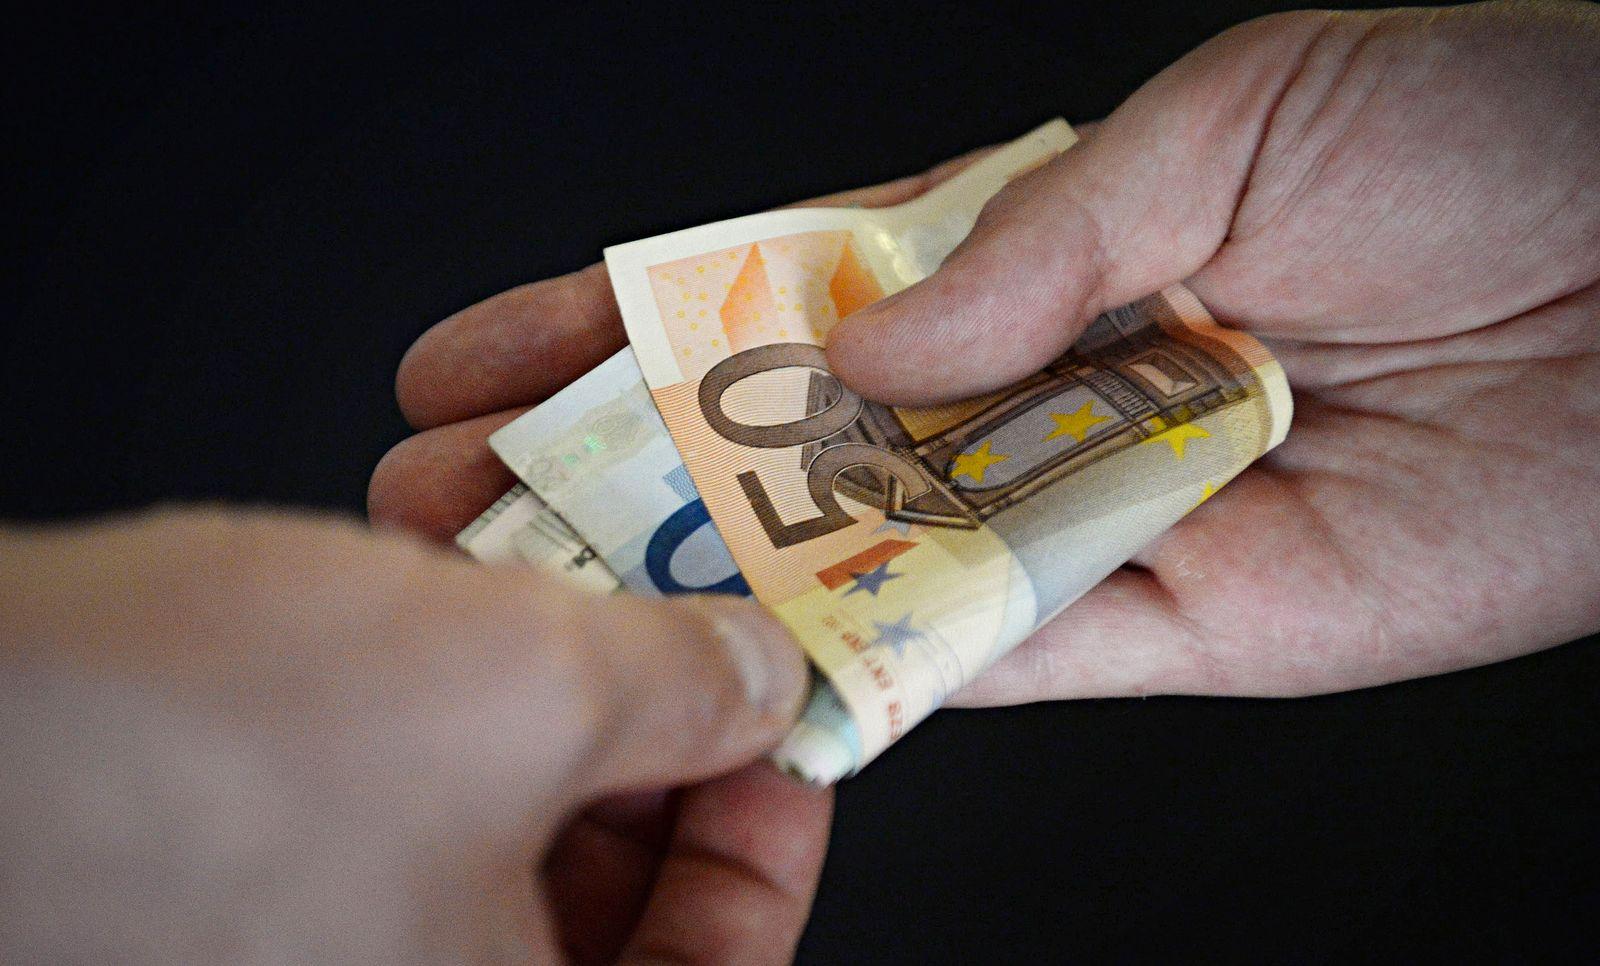 KaSP Bestechung Korruption SYMBOLBILD